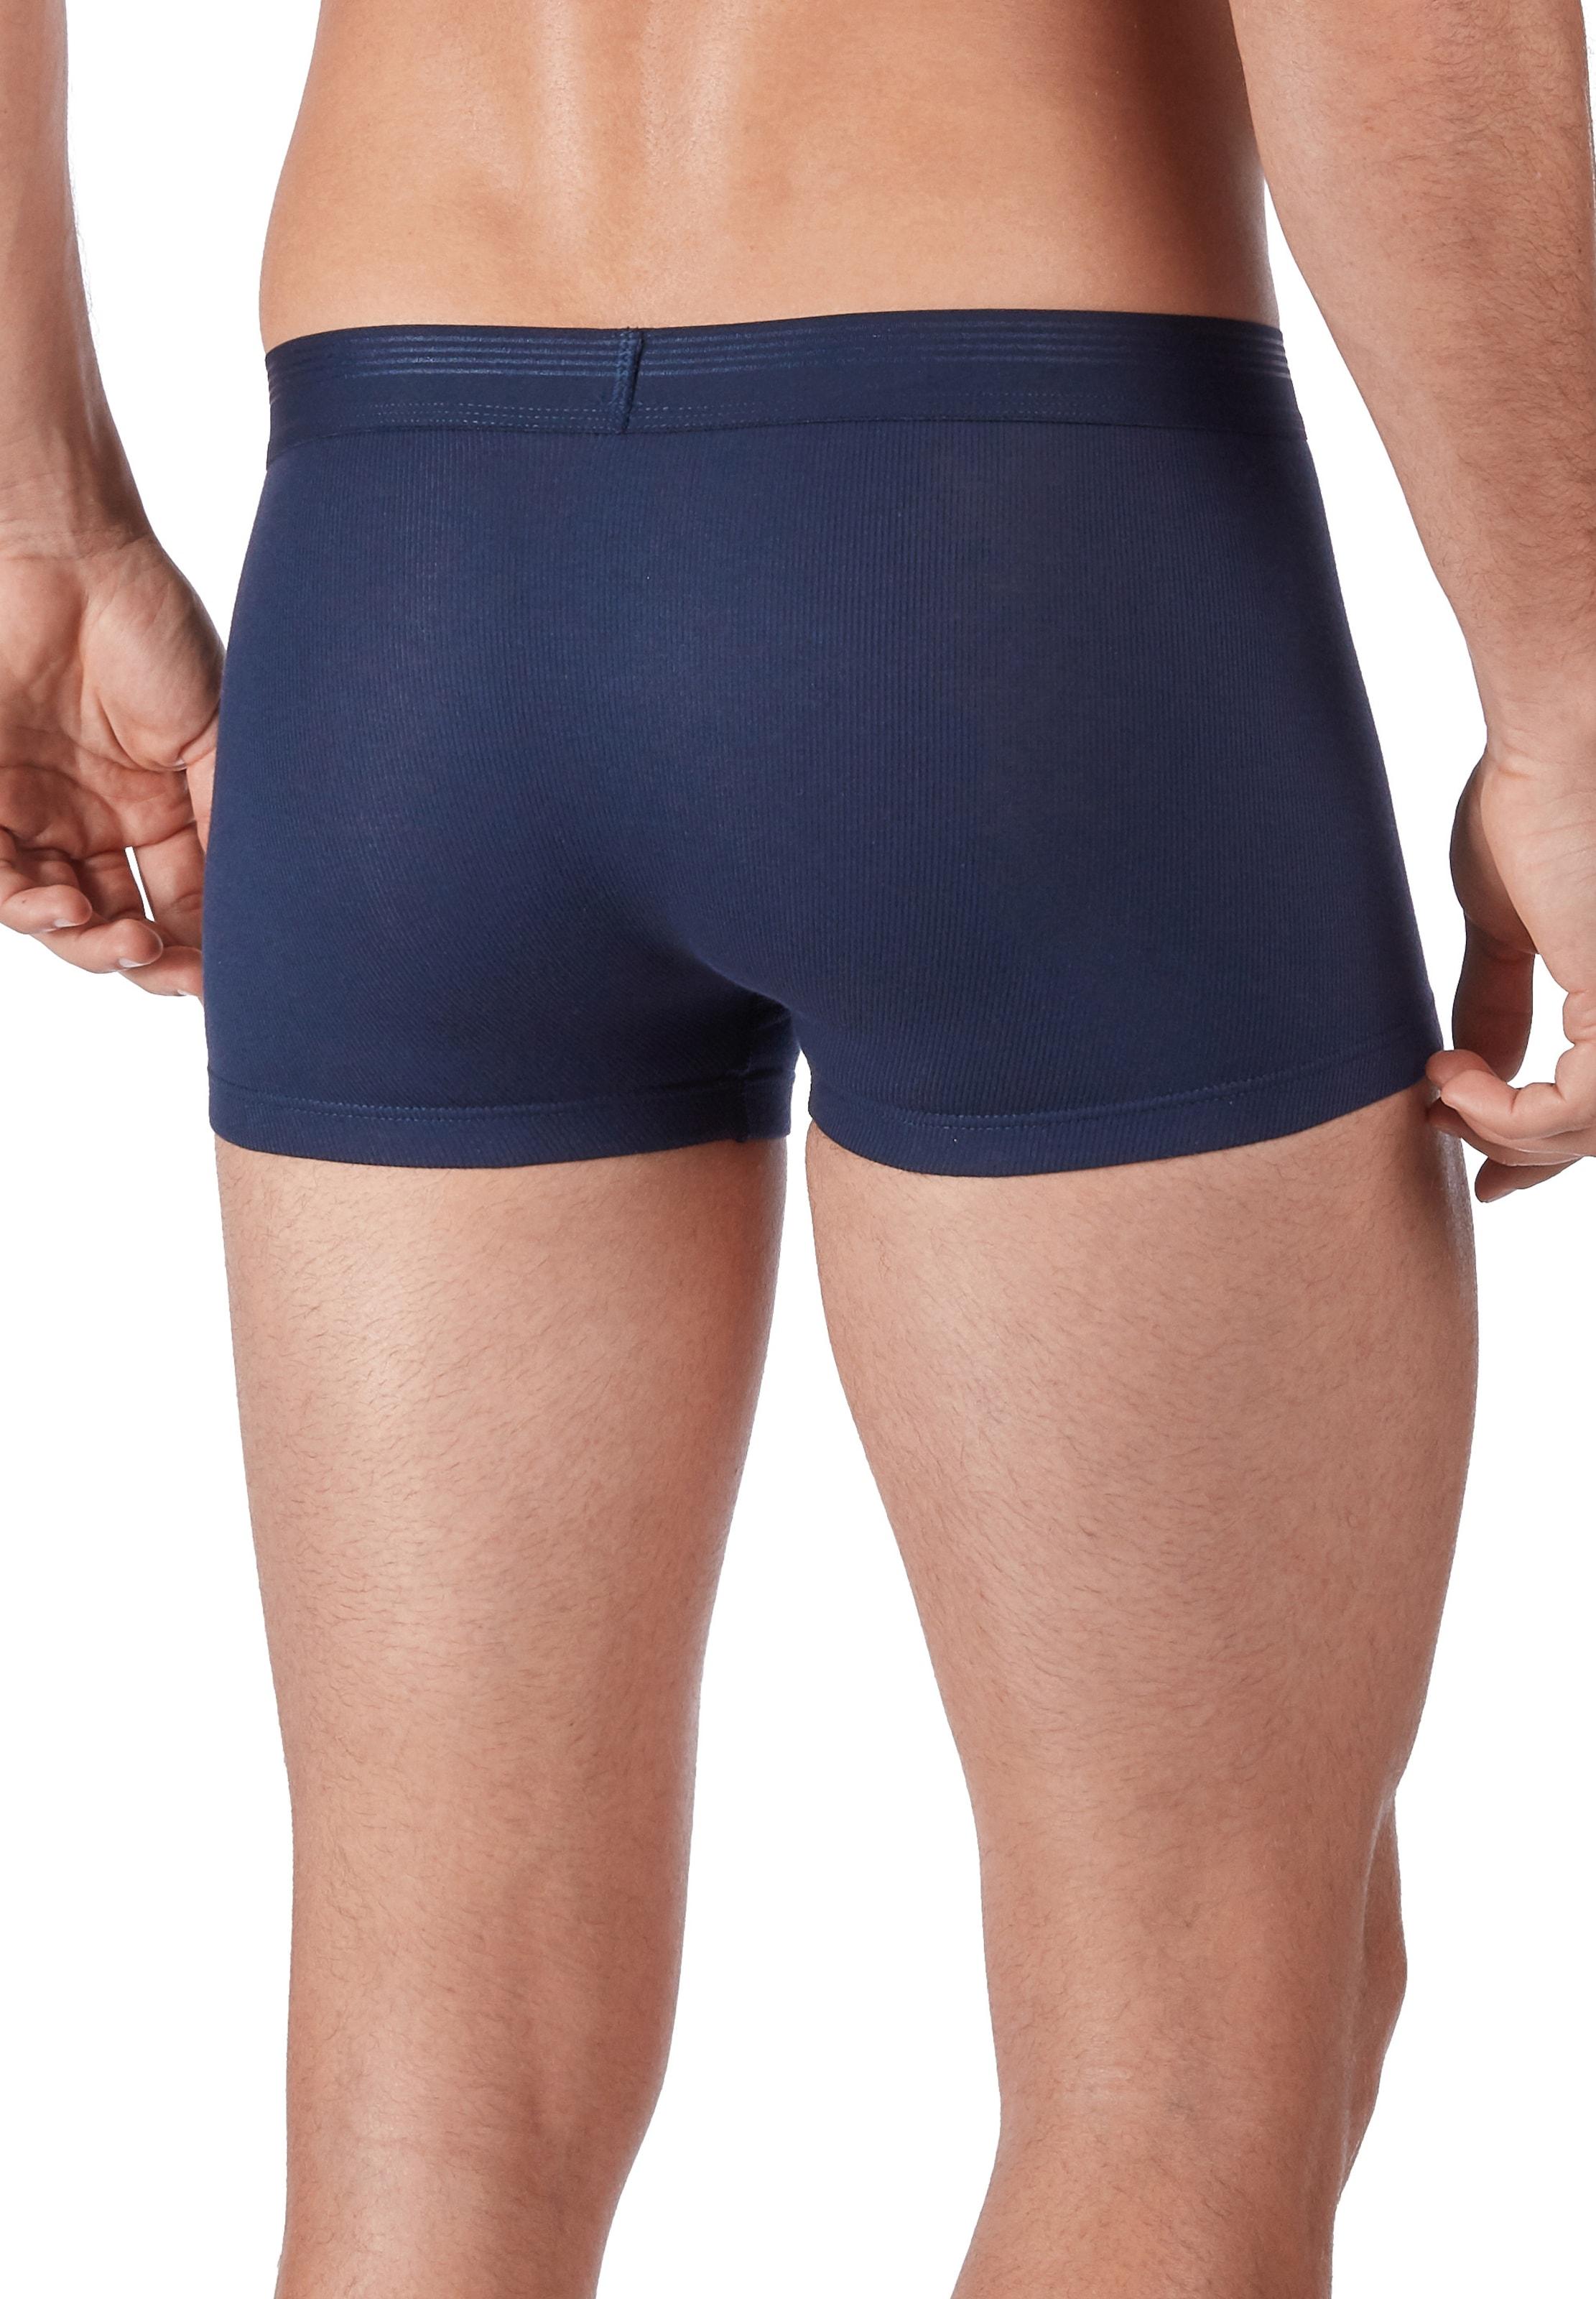 Pants 'comfort Plus' Marine In Huber shQxdCtr